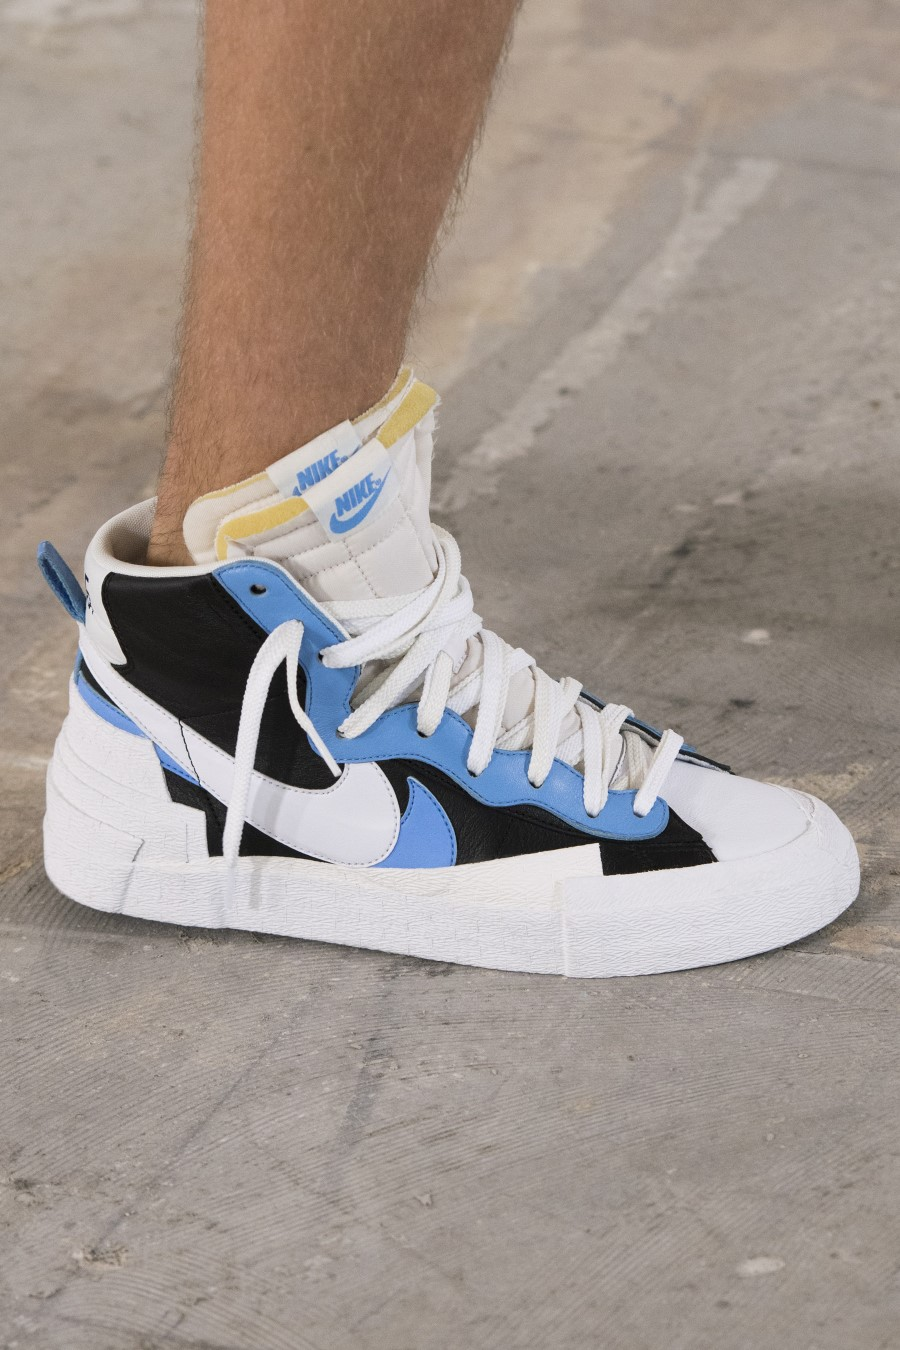 Sacai x Nike Printemps/Été 2019